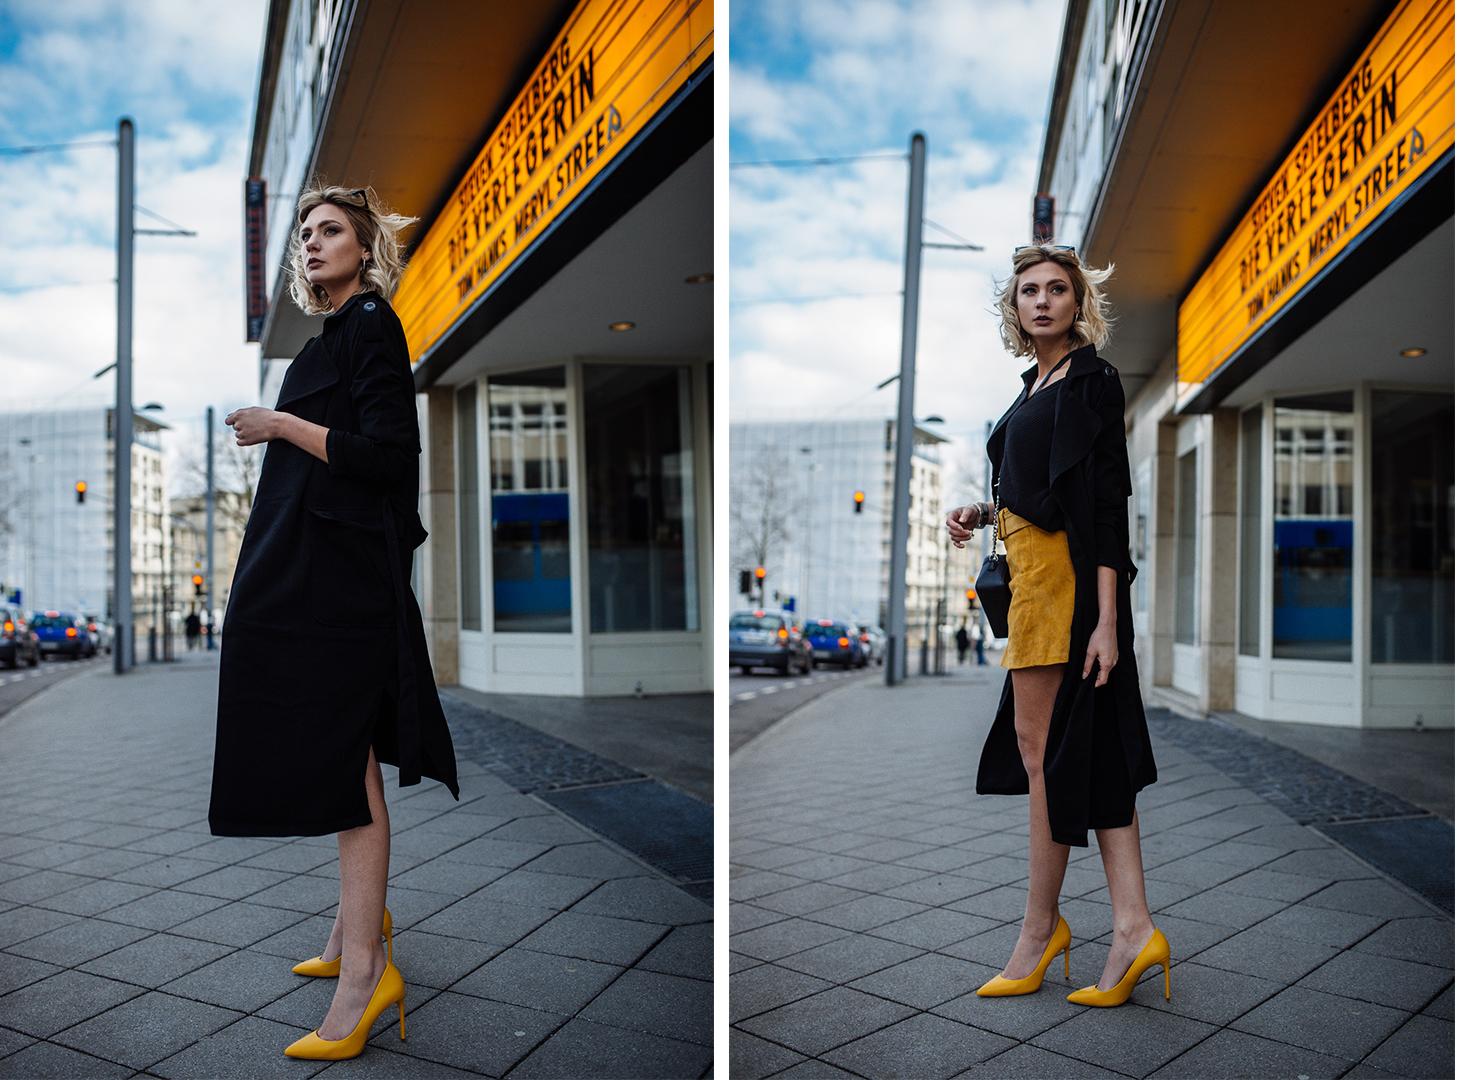 Trendfarbe Gelb kombinieren_Trendfarbe 2018_Modetrend Sommer Frühling 2018_Modeblog_Kiamisu-final5